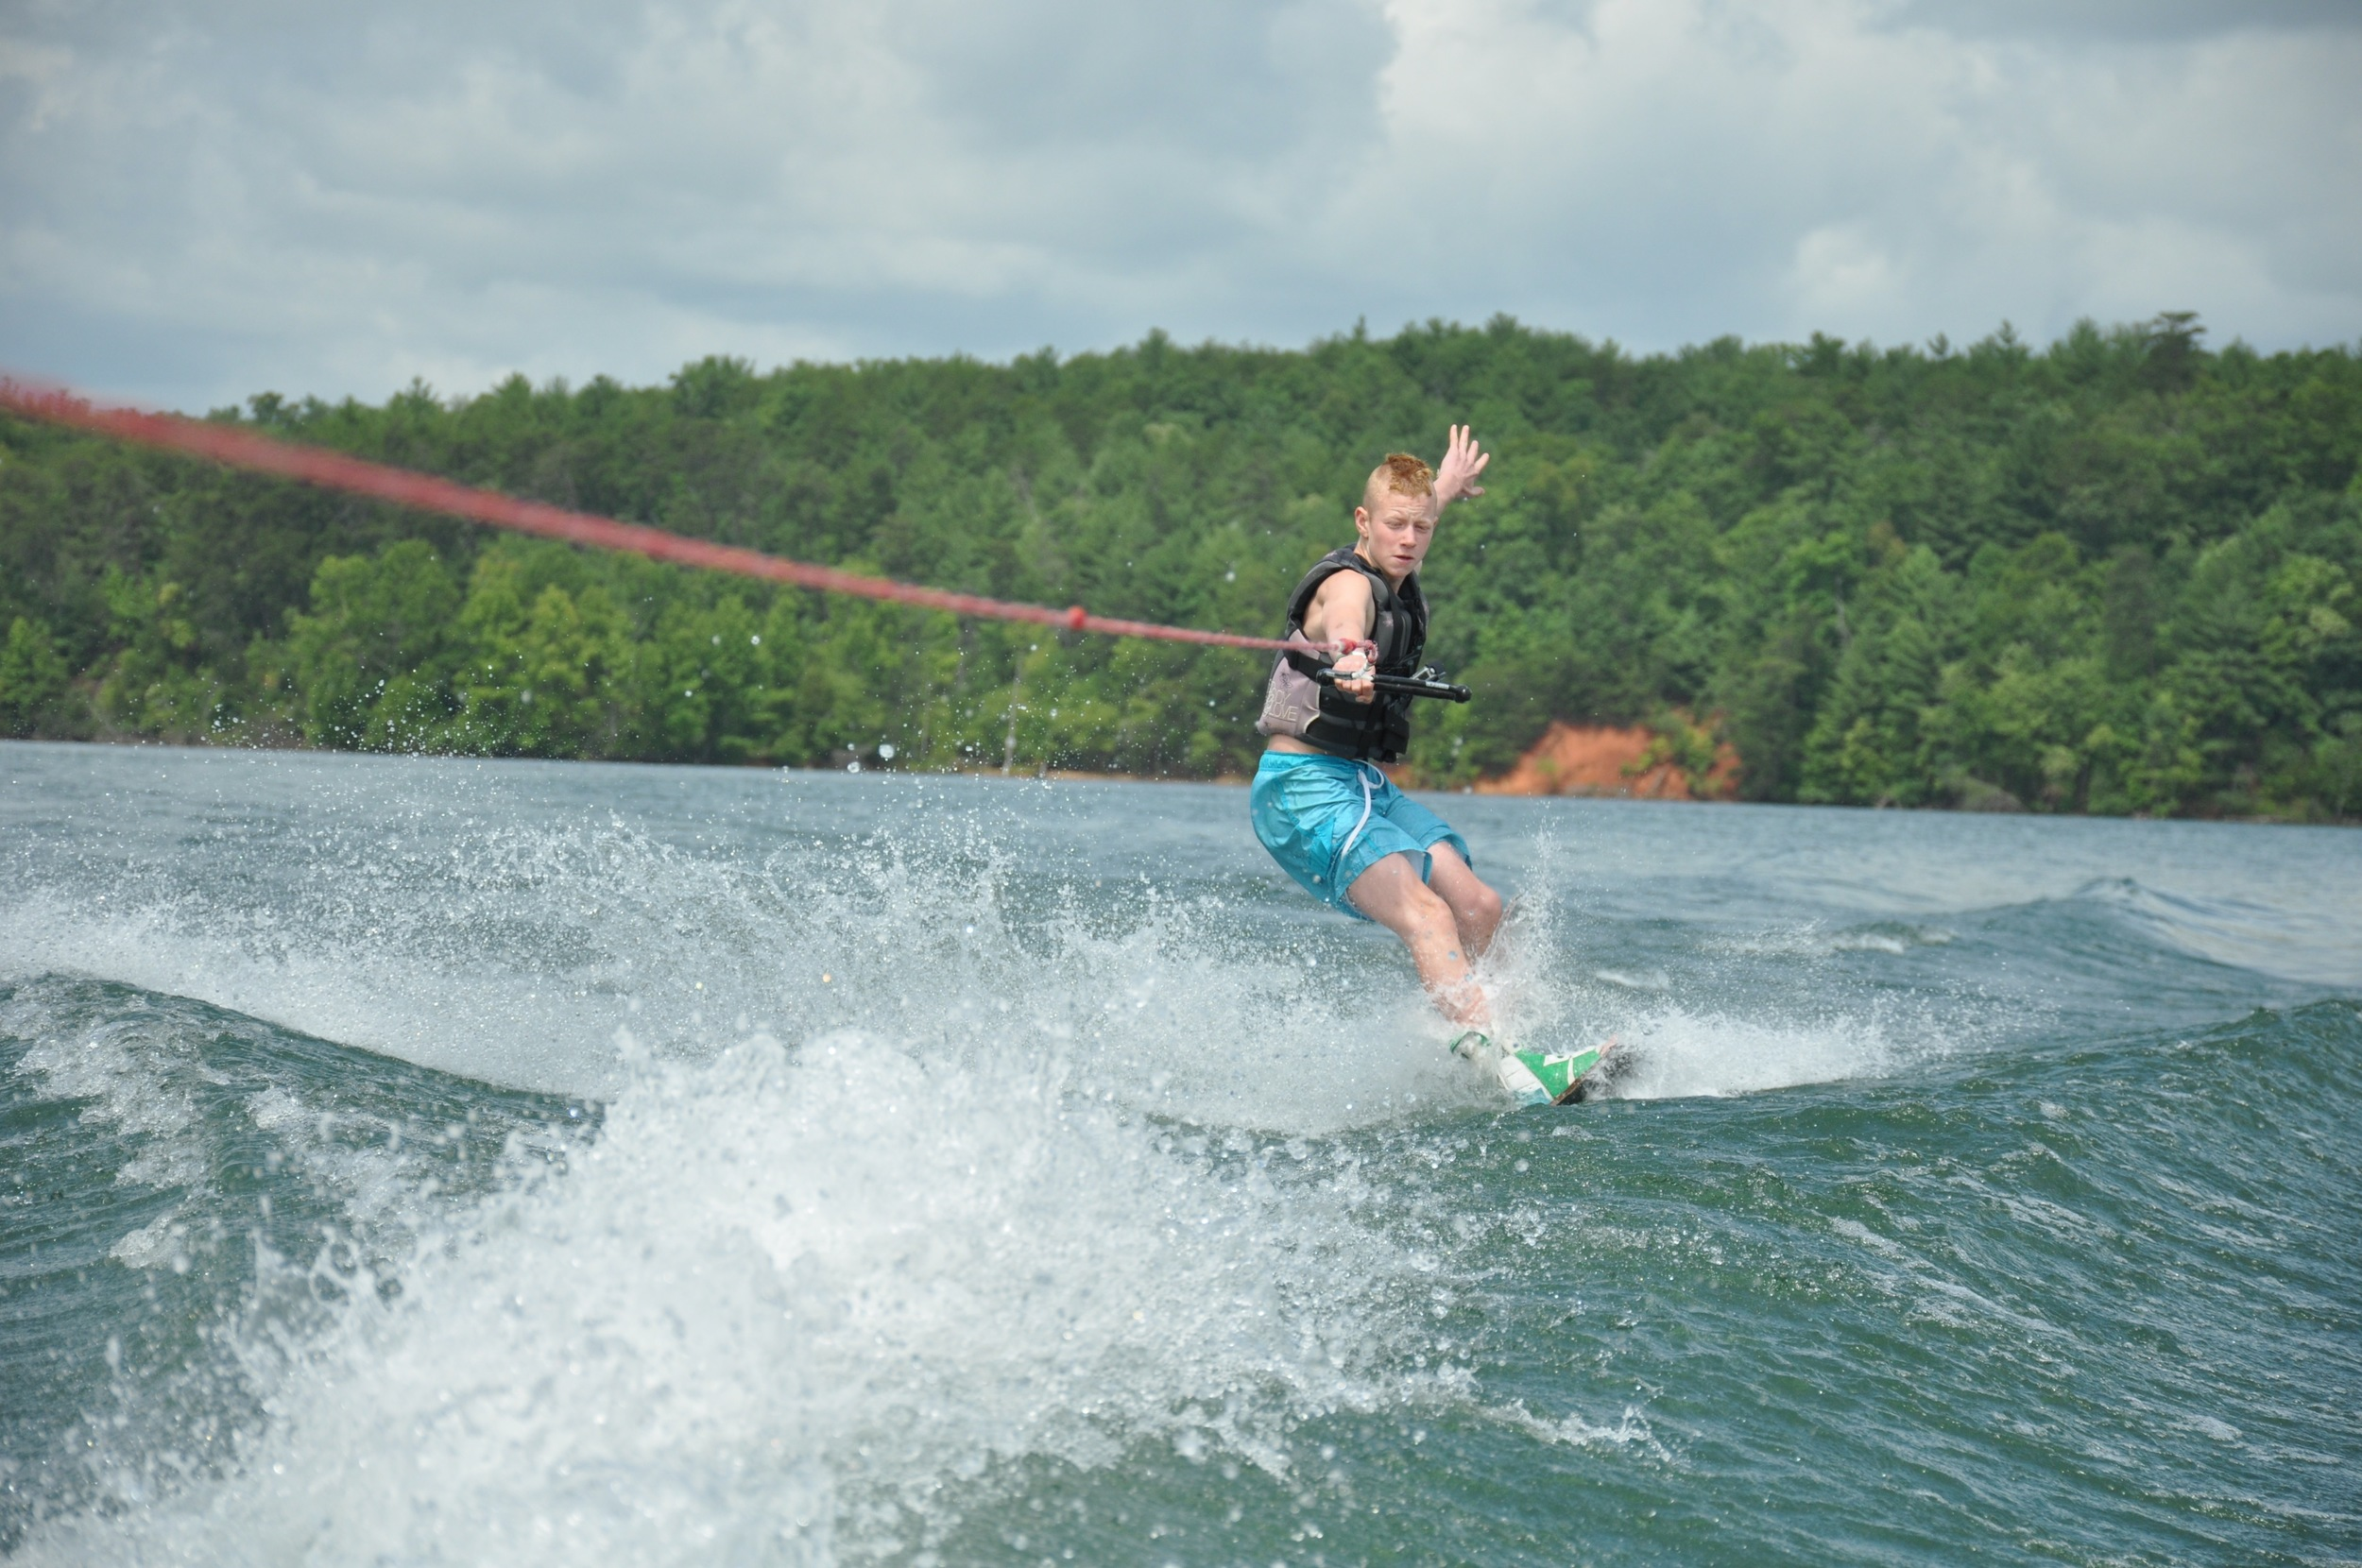 jesse-wakeboards-like-a-boss.jpg